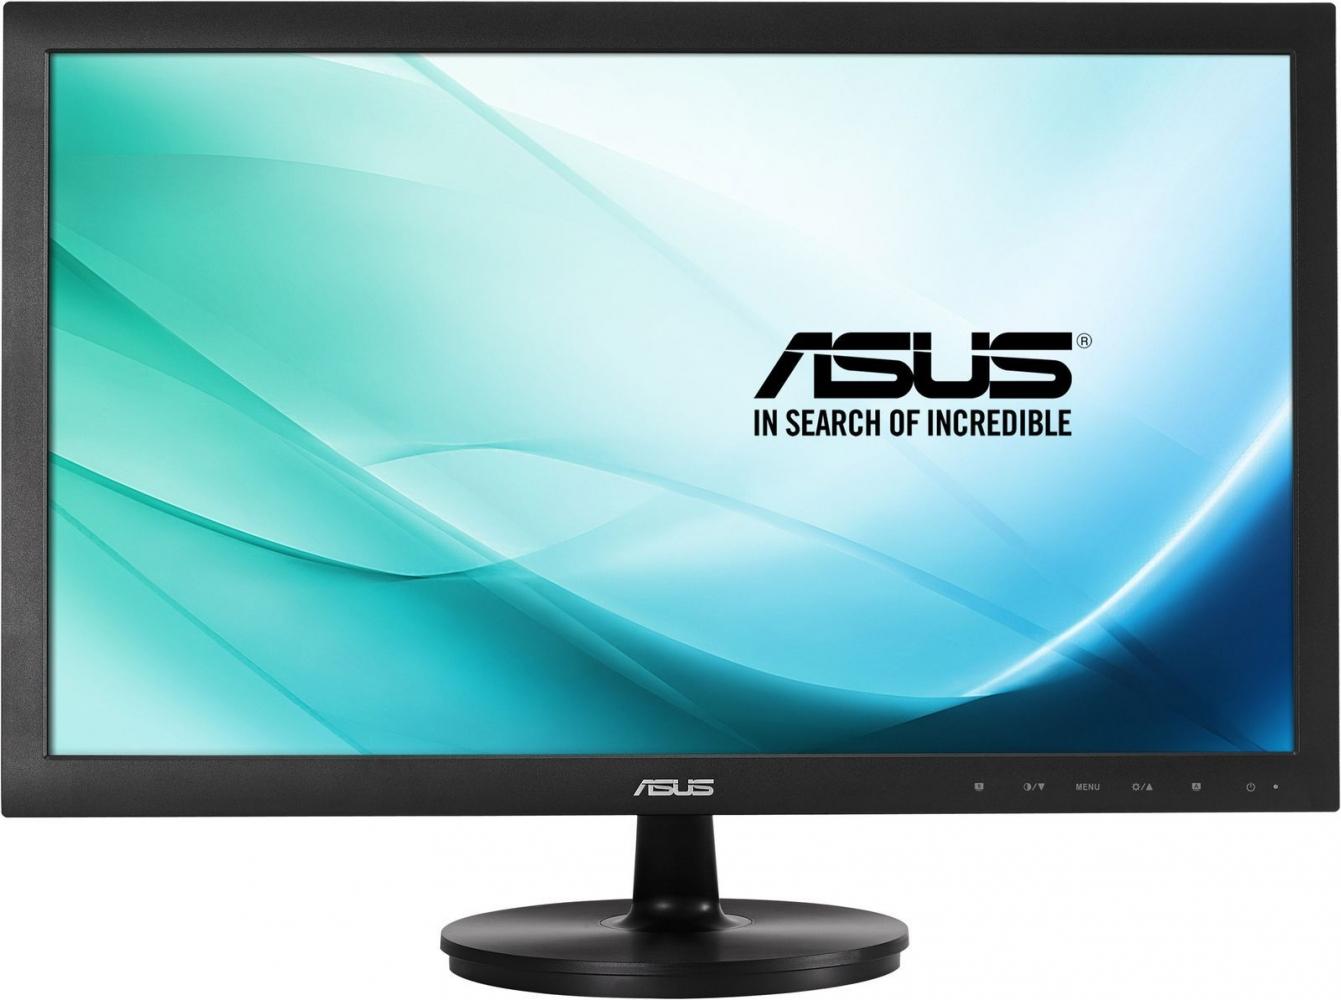 Монитор ASUS VS247NR BK/5MS/EU/DSUB+DVI